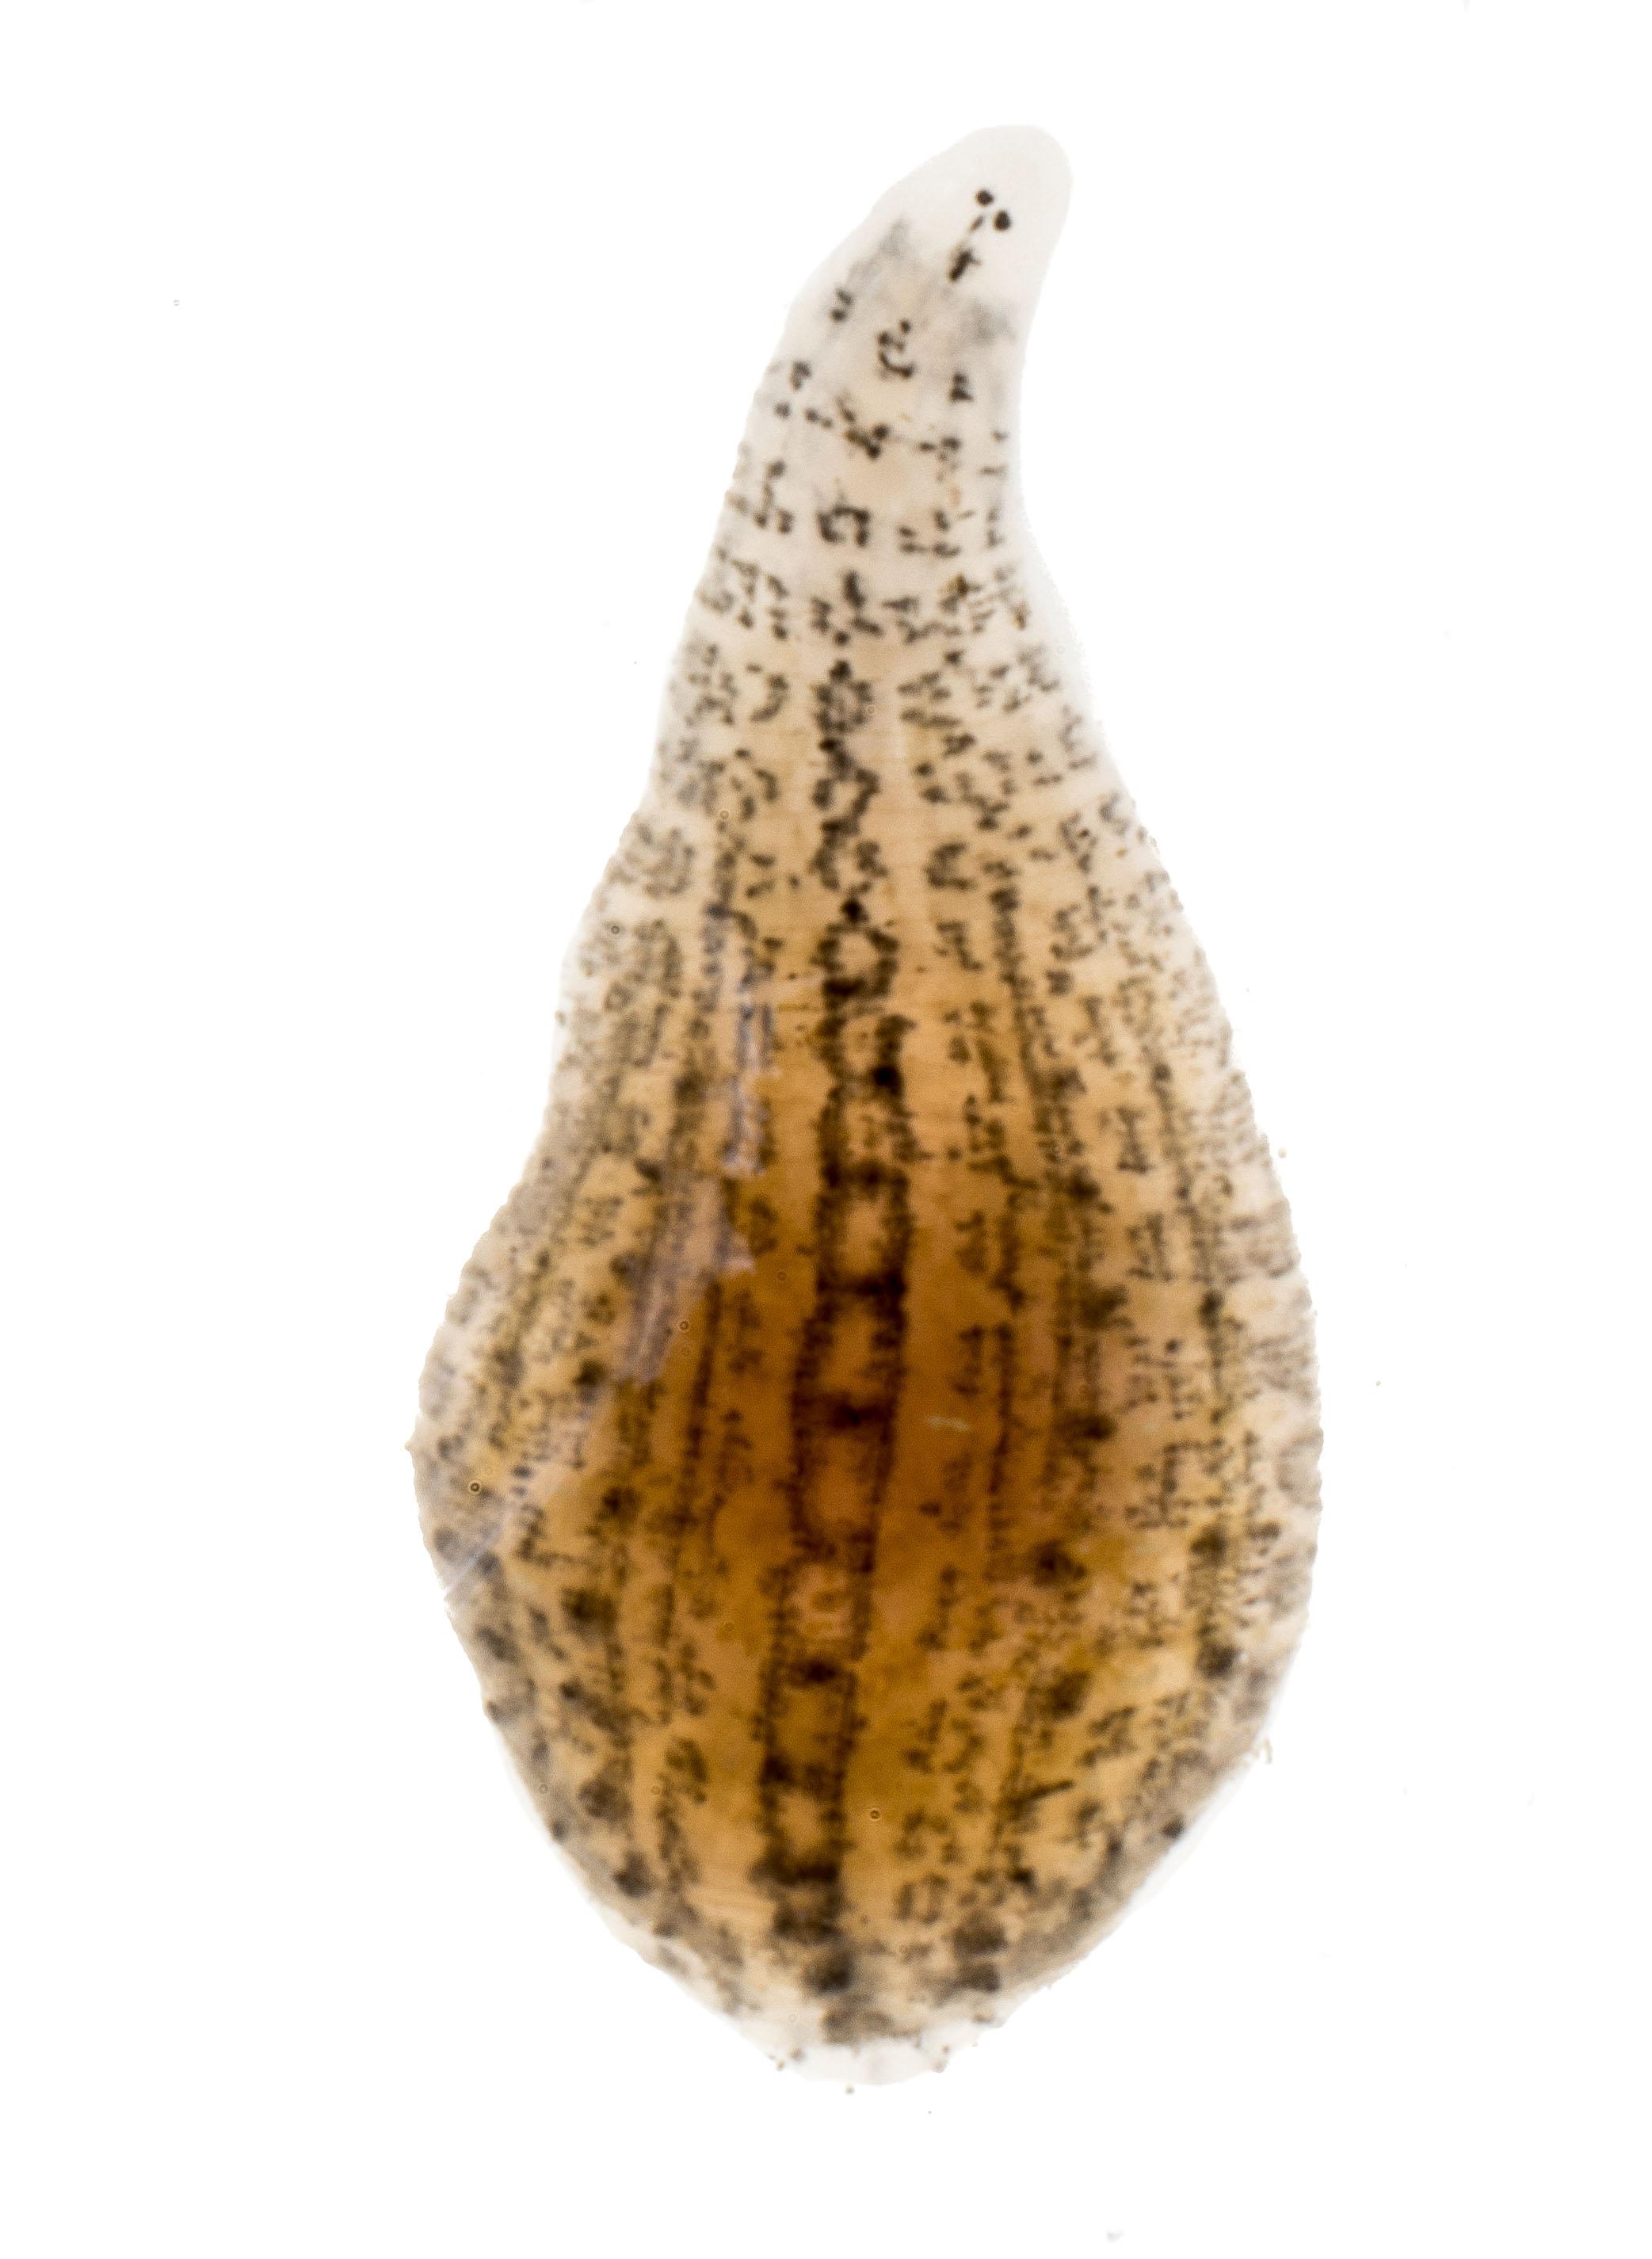 Glossiphoniidae_03.jpg